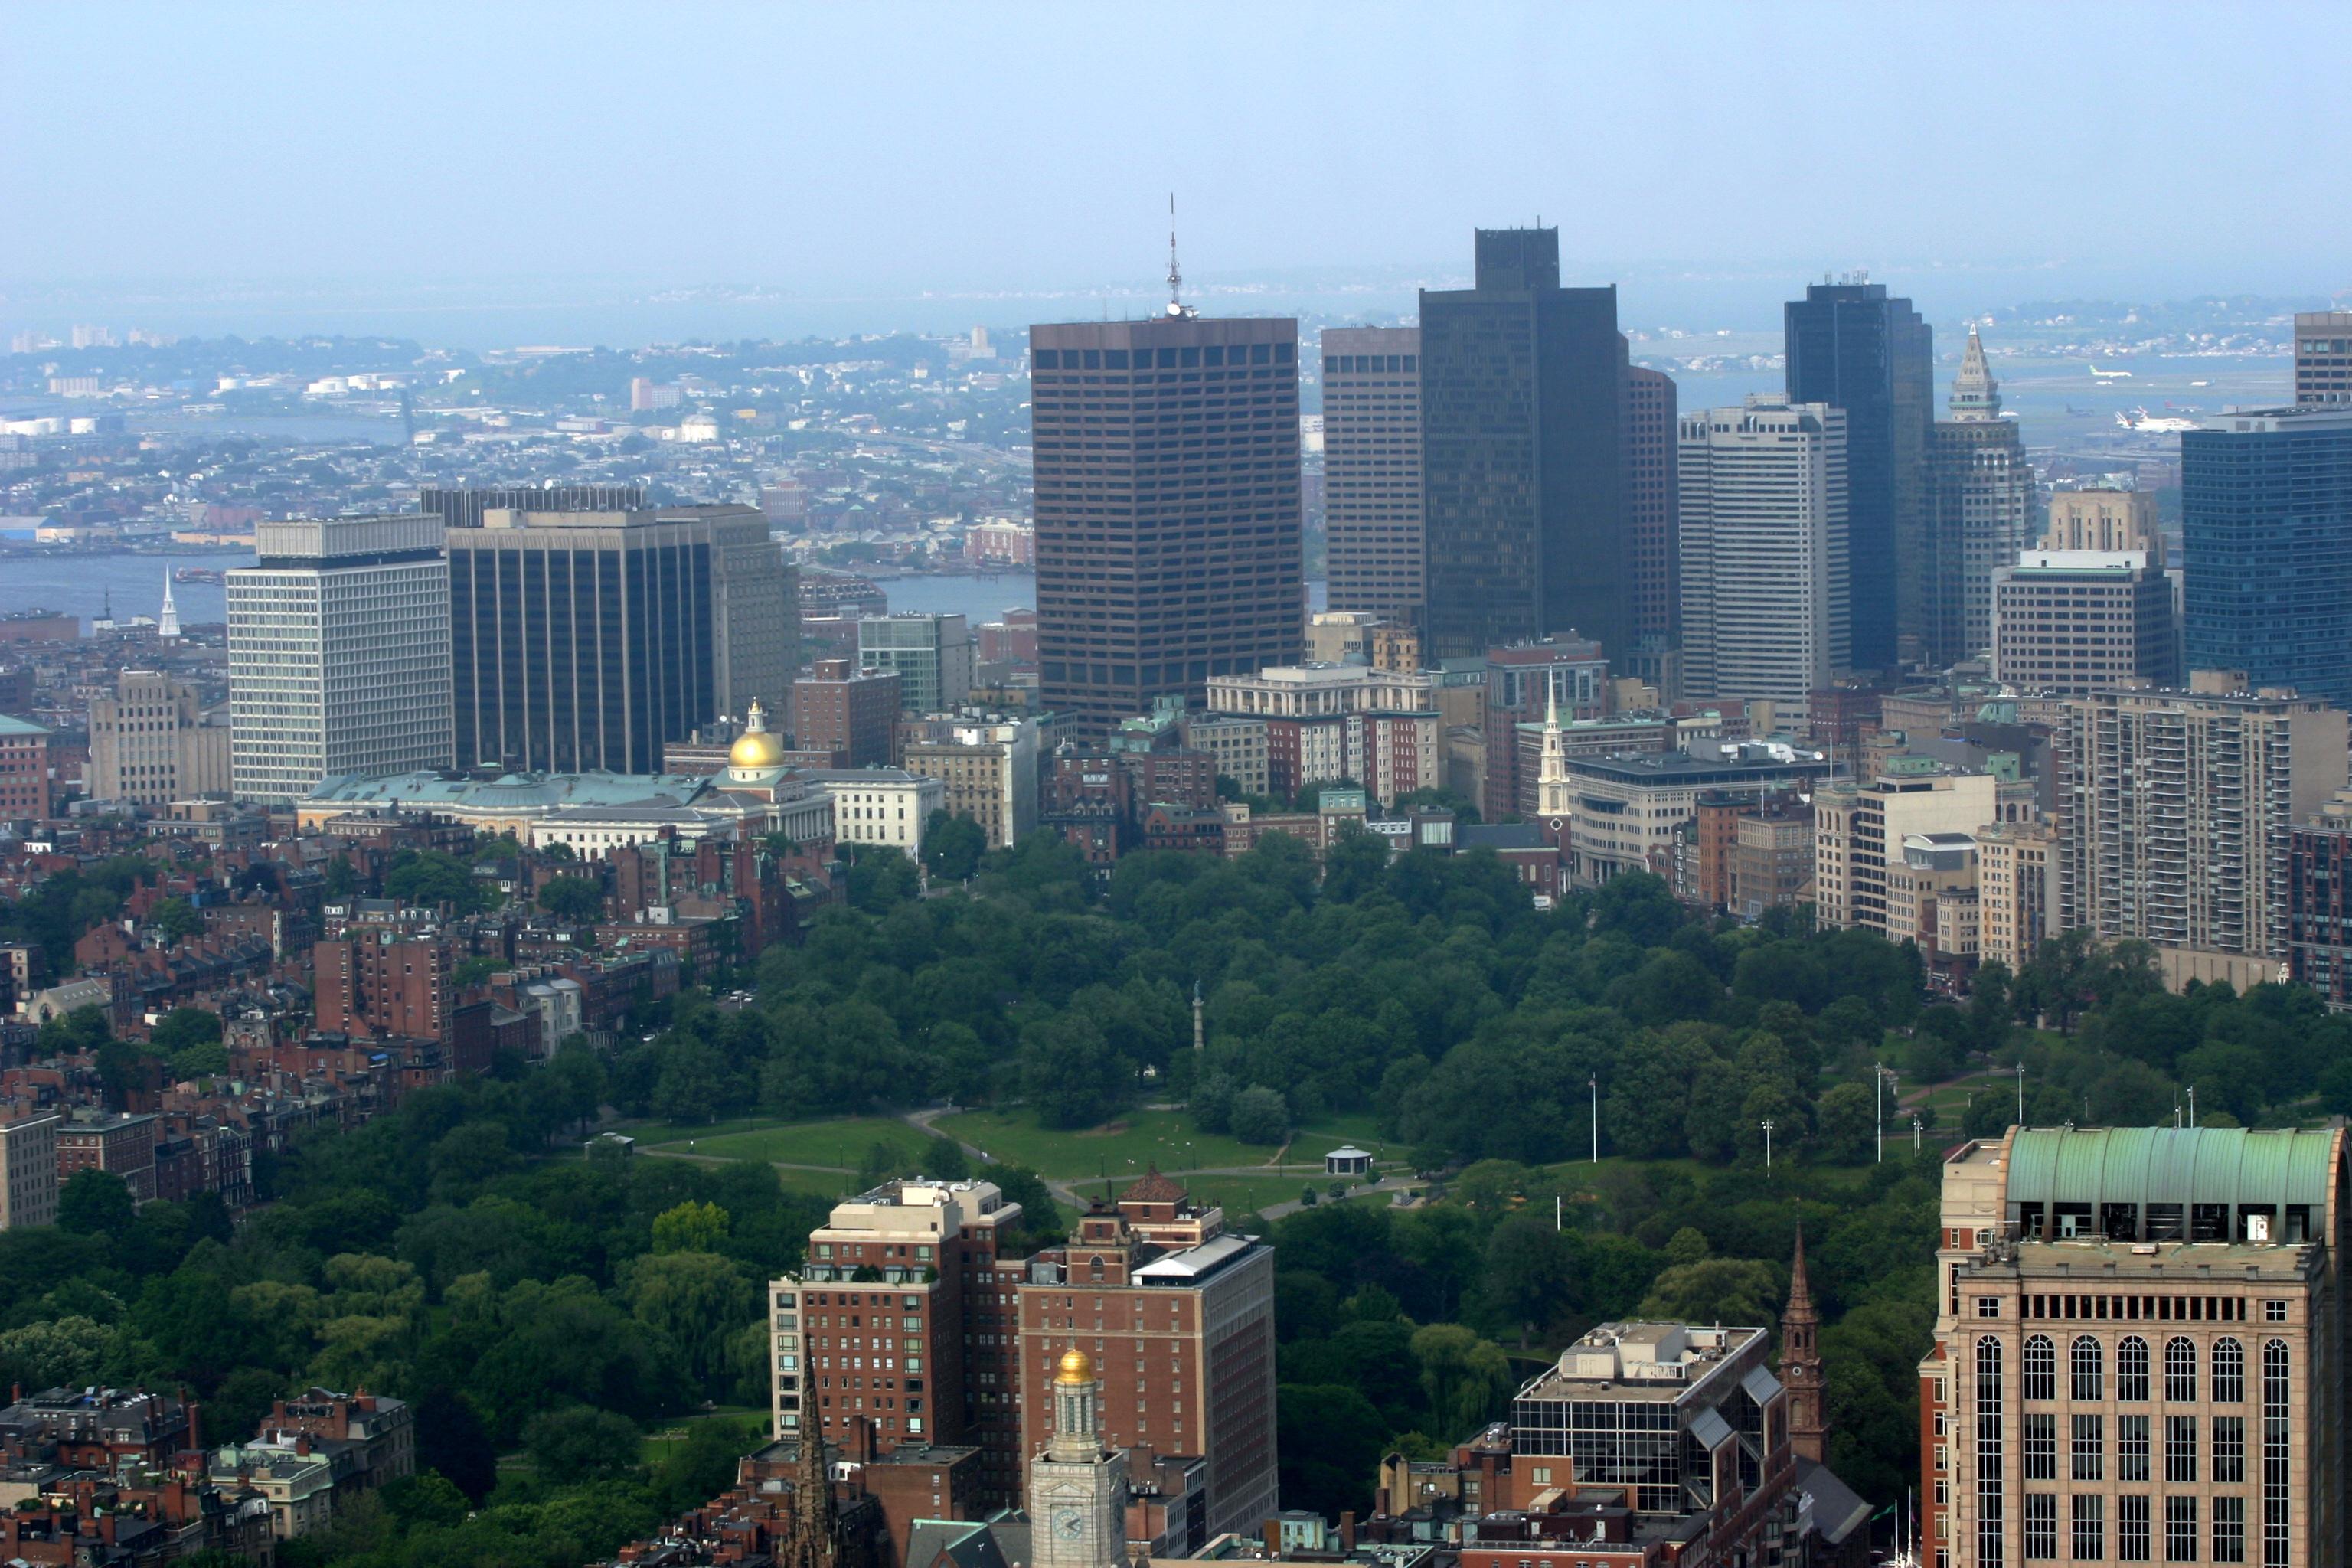 https://upload.wikimedia.org/wikipedia/commons/f/fe/Boston_common_20060619.jpg